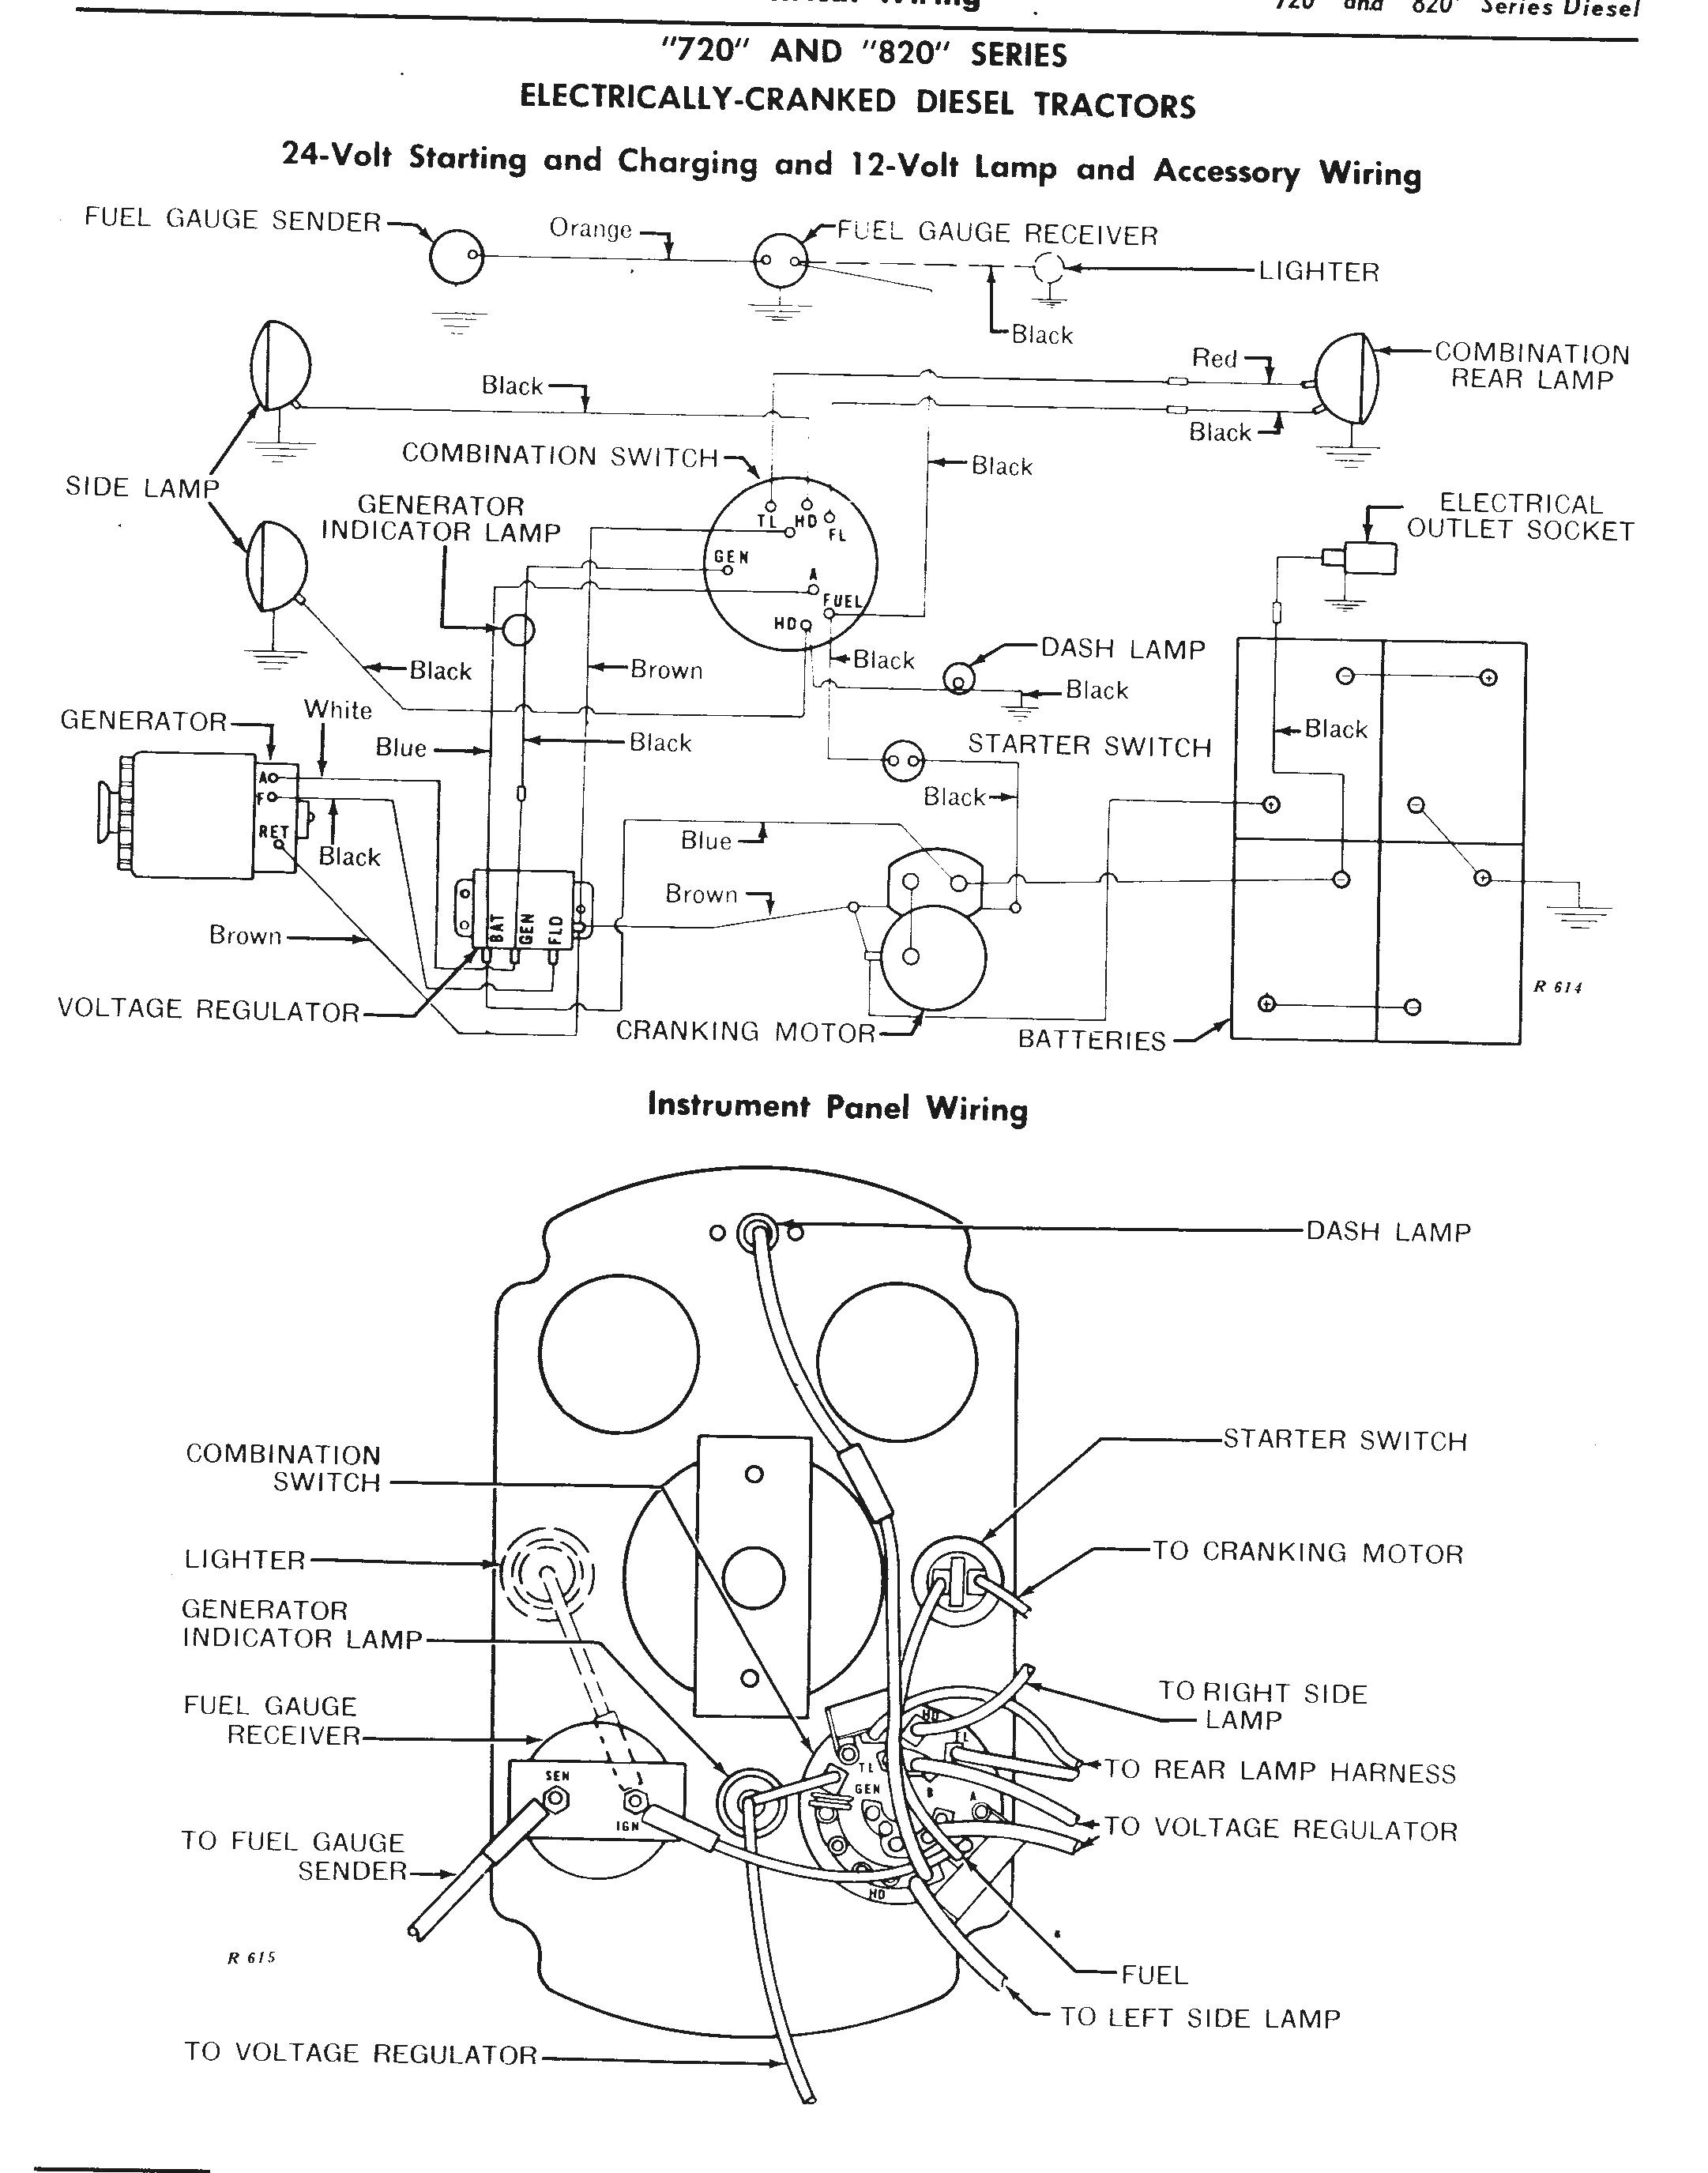 Farmall 140 12v Wiring Diagram - Wiring Diagrams List on